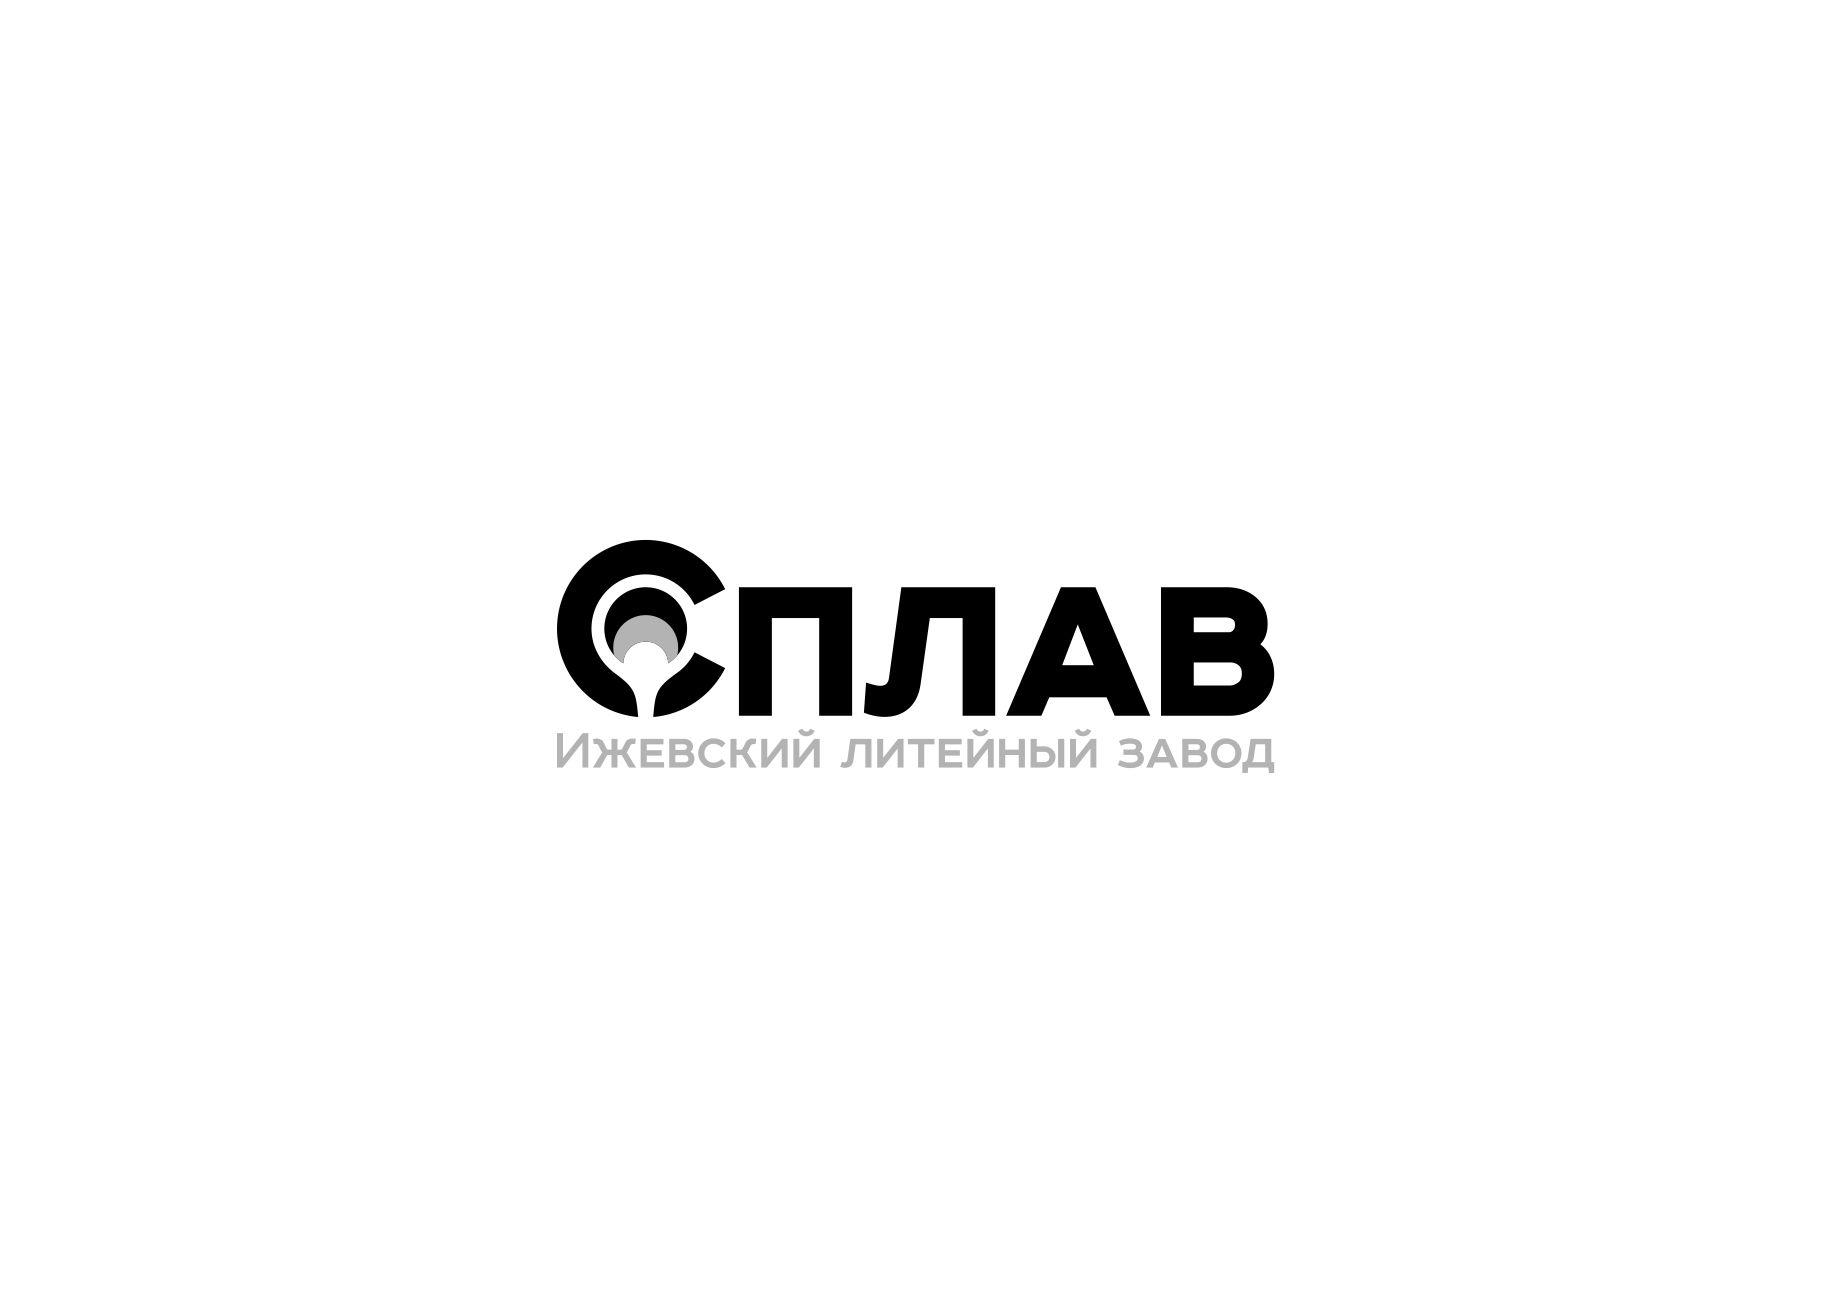 Разработать логотип для литейного завода фото f_9675afd4db180891.jpg